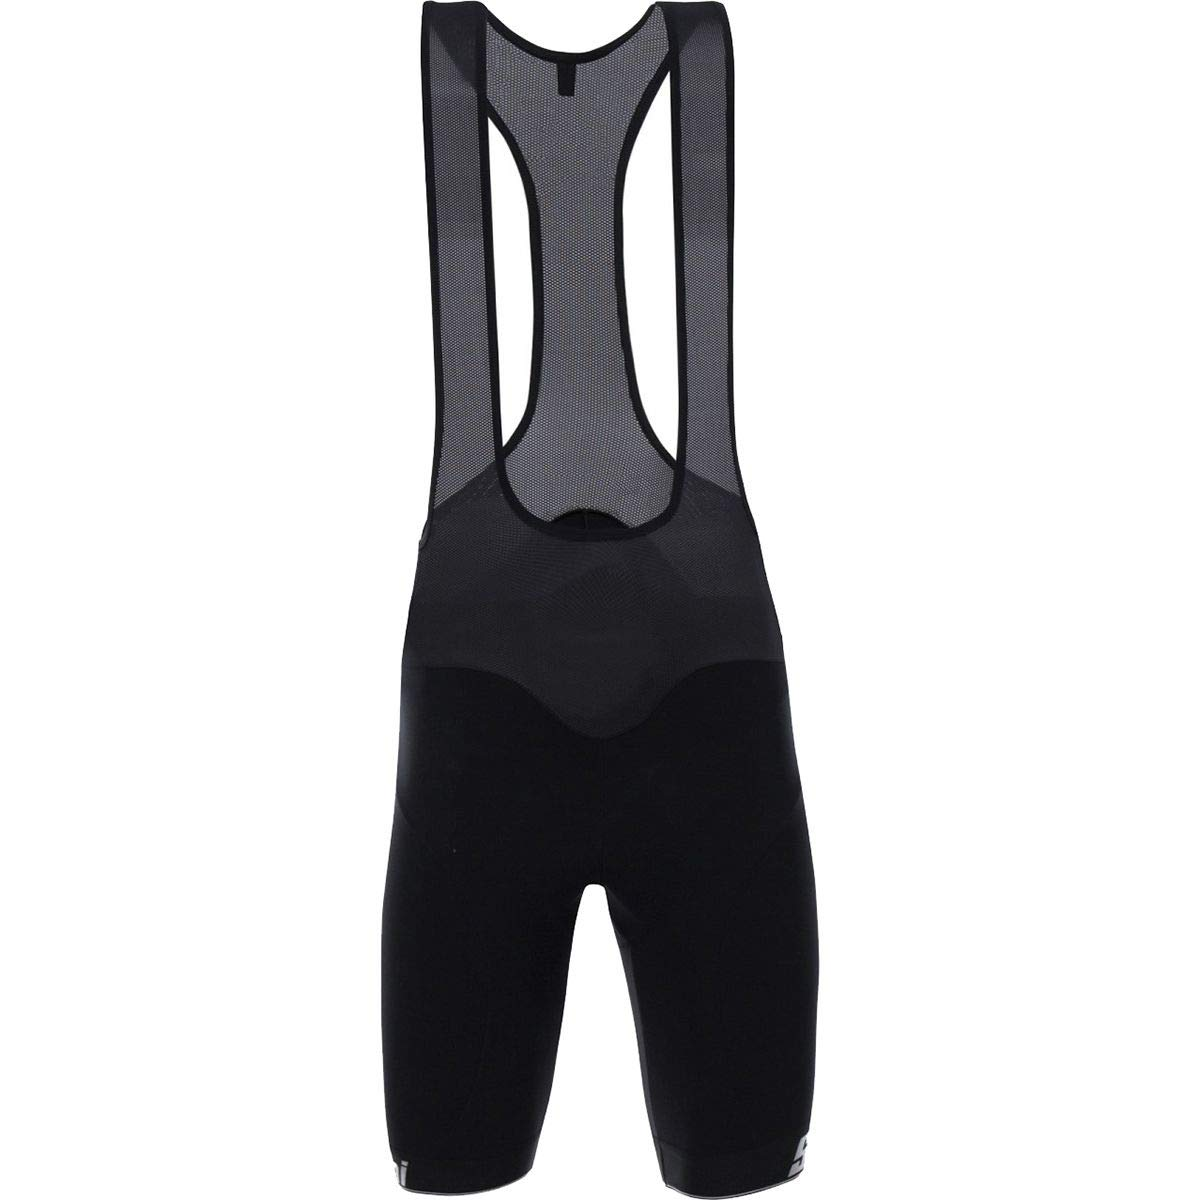 Santiniブラック2017 Eureka Thermal h20 Cycling Bib Shorts Large  B0767N4D95